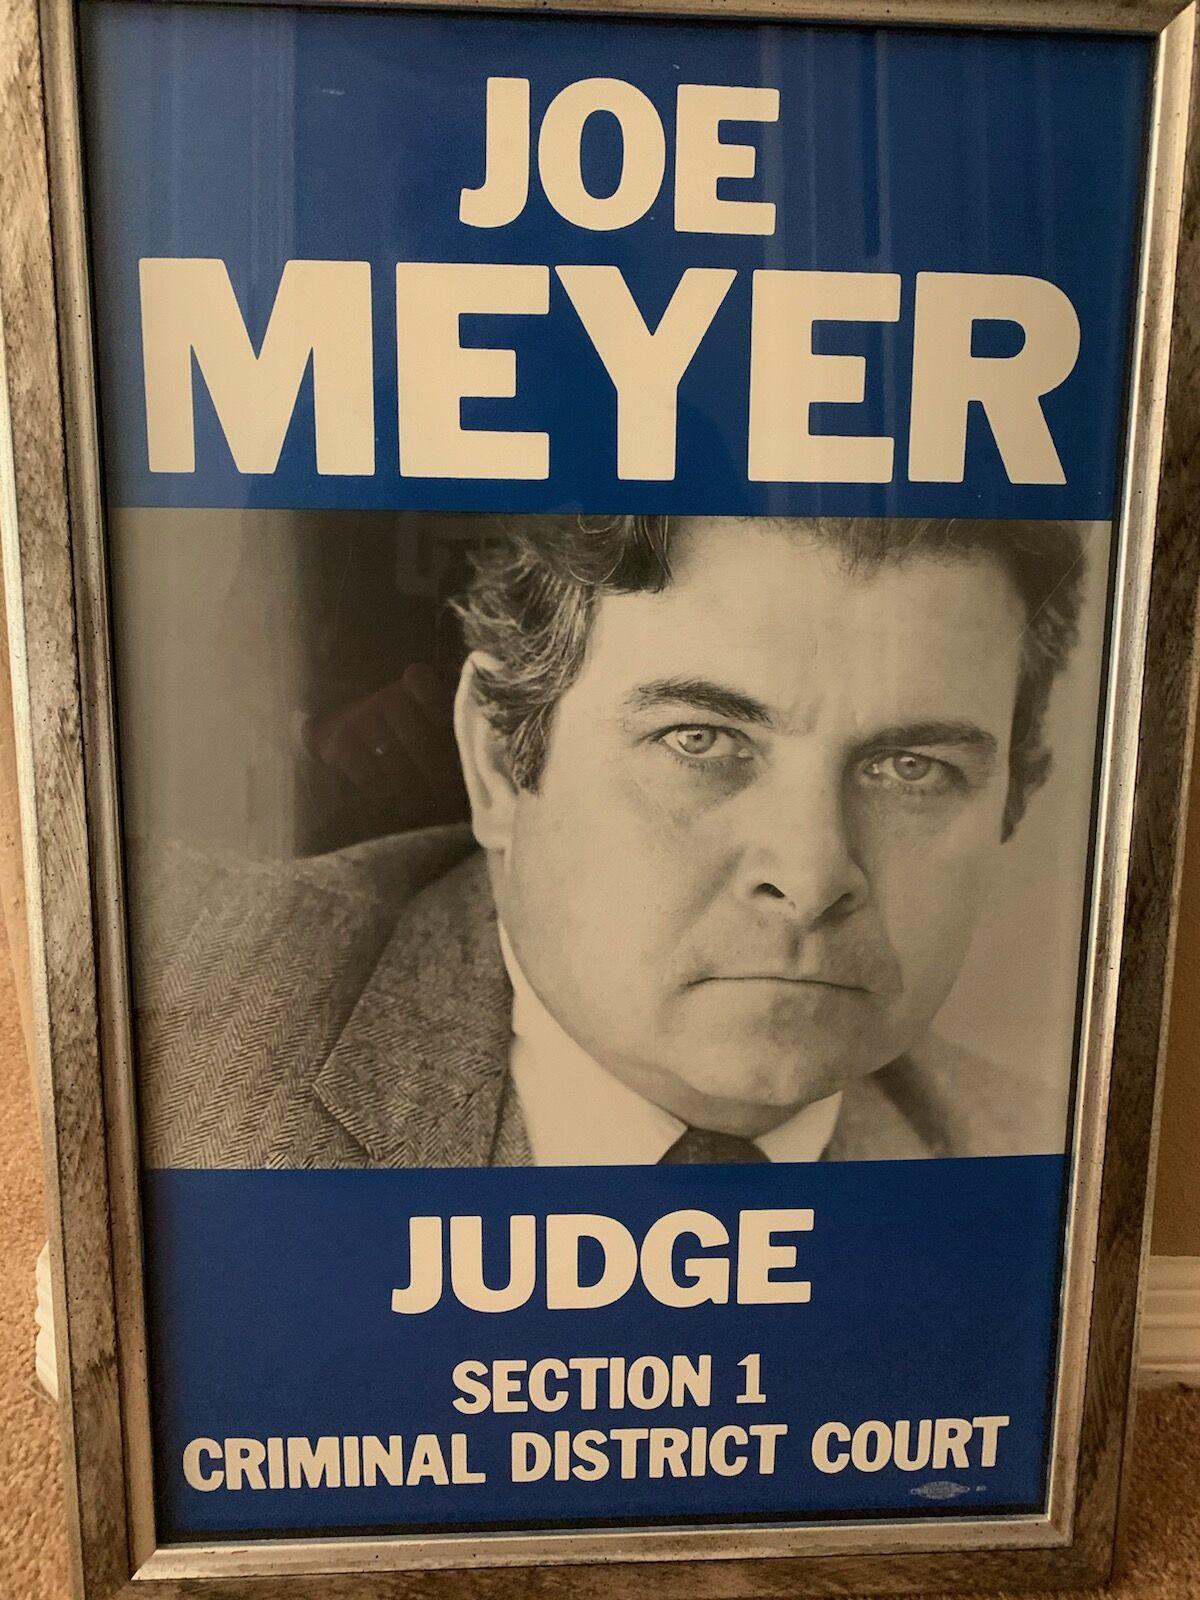 Joe Meyer campaign poster